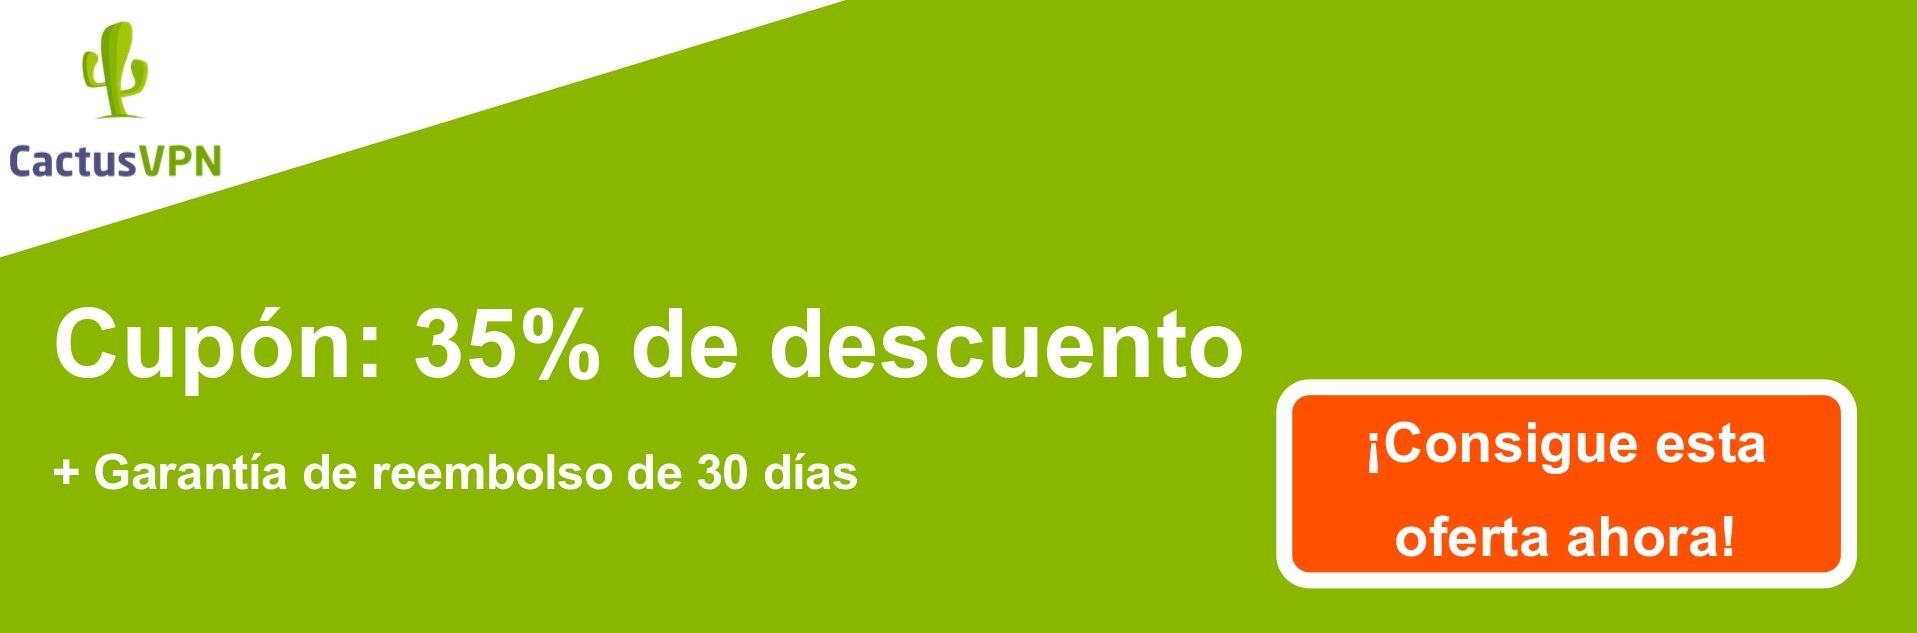 Banner de cupón CactusVPN: 38% de descuento